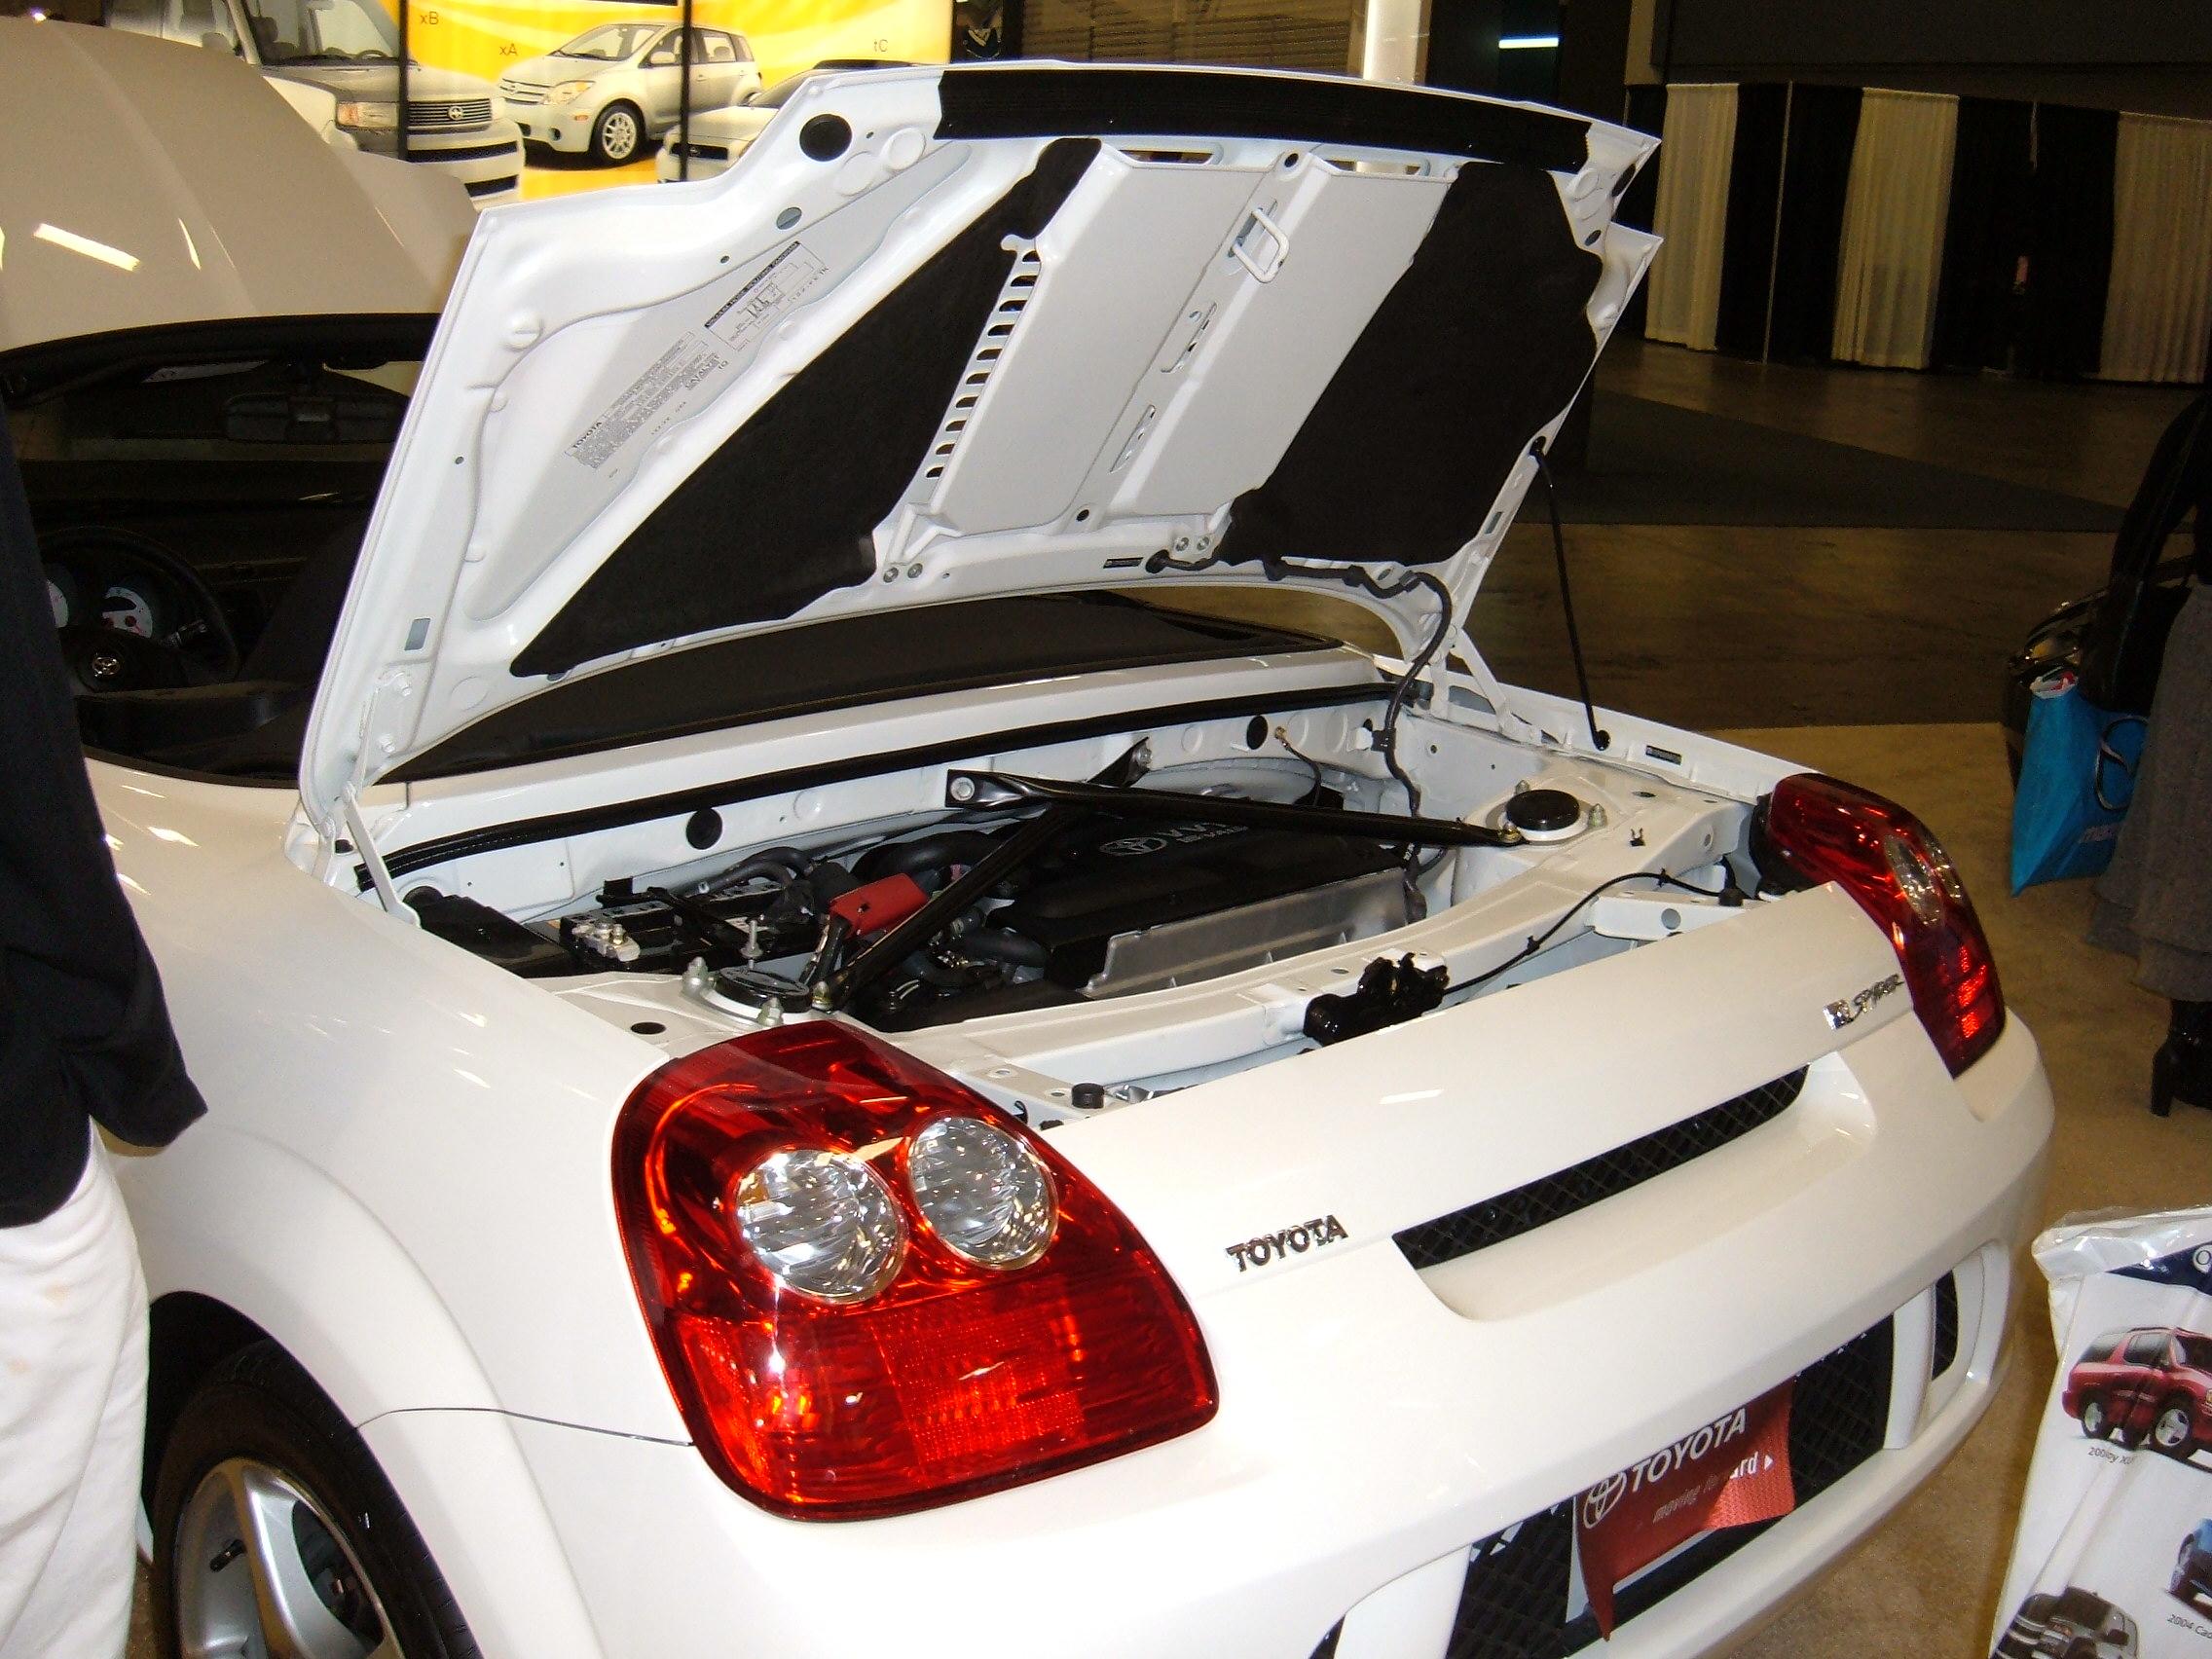 Toyota San Francisco >> File:2005 white Toyota MR2 engine.JPG - Wikimedia Commons